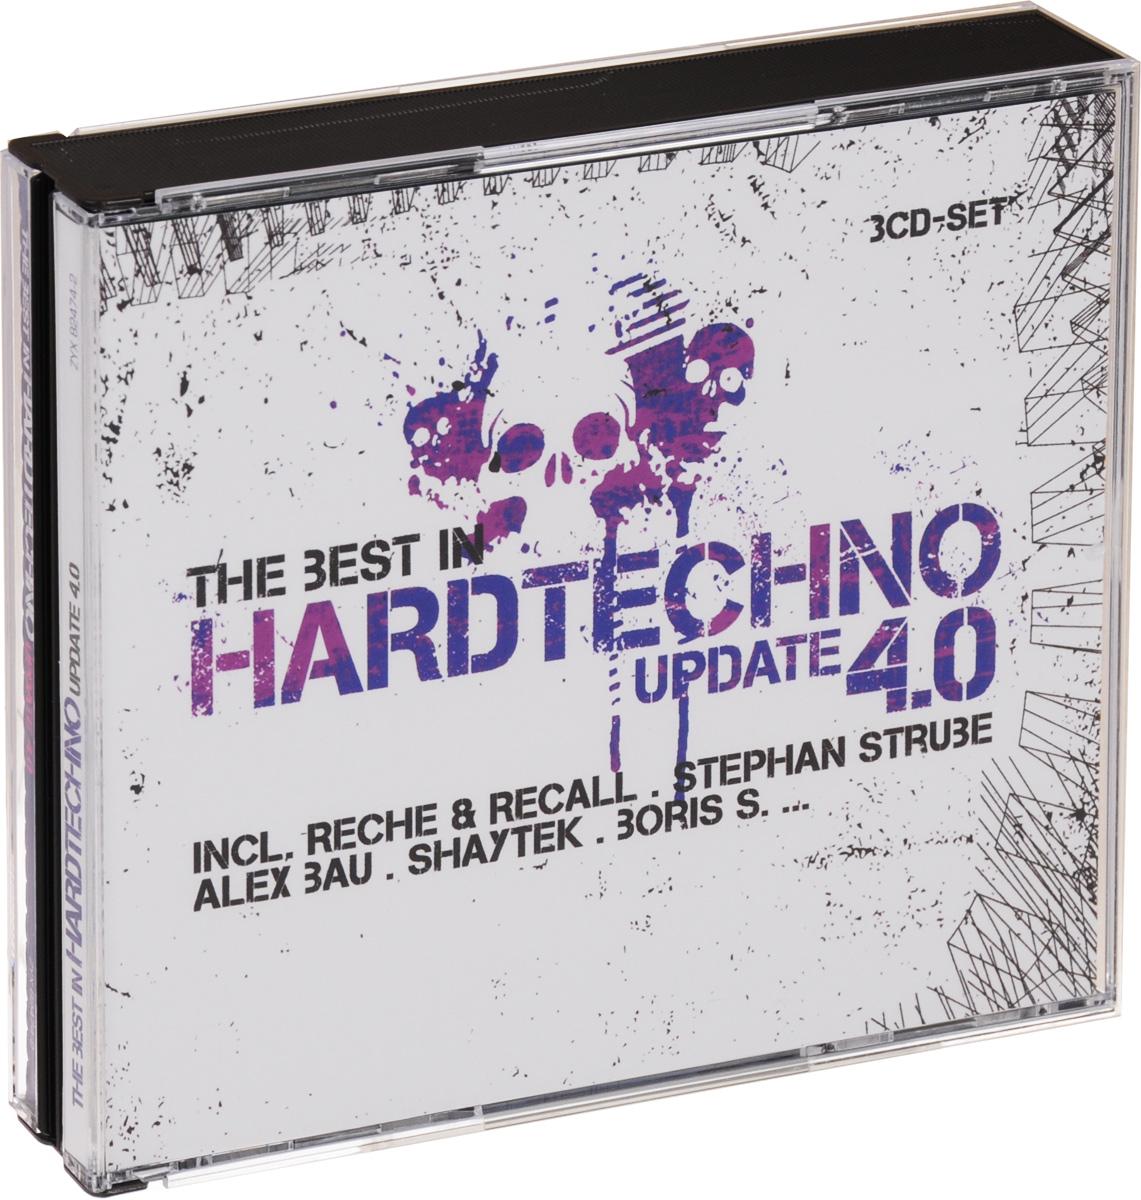 The Best In Hardtechno. Update 4.0 (3 CD) михаил плетнев филип лейджер роджер норрингтон джон нельсон сабин мейер best adagios 50 3 cd